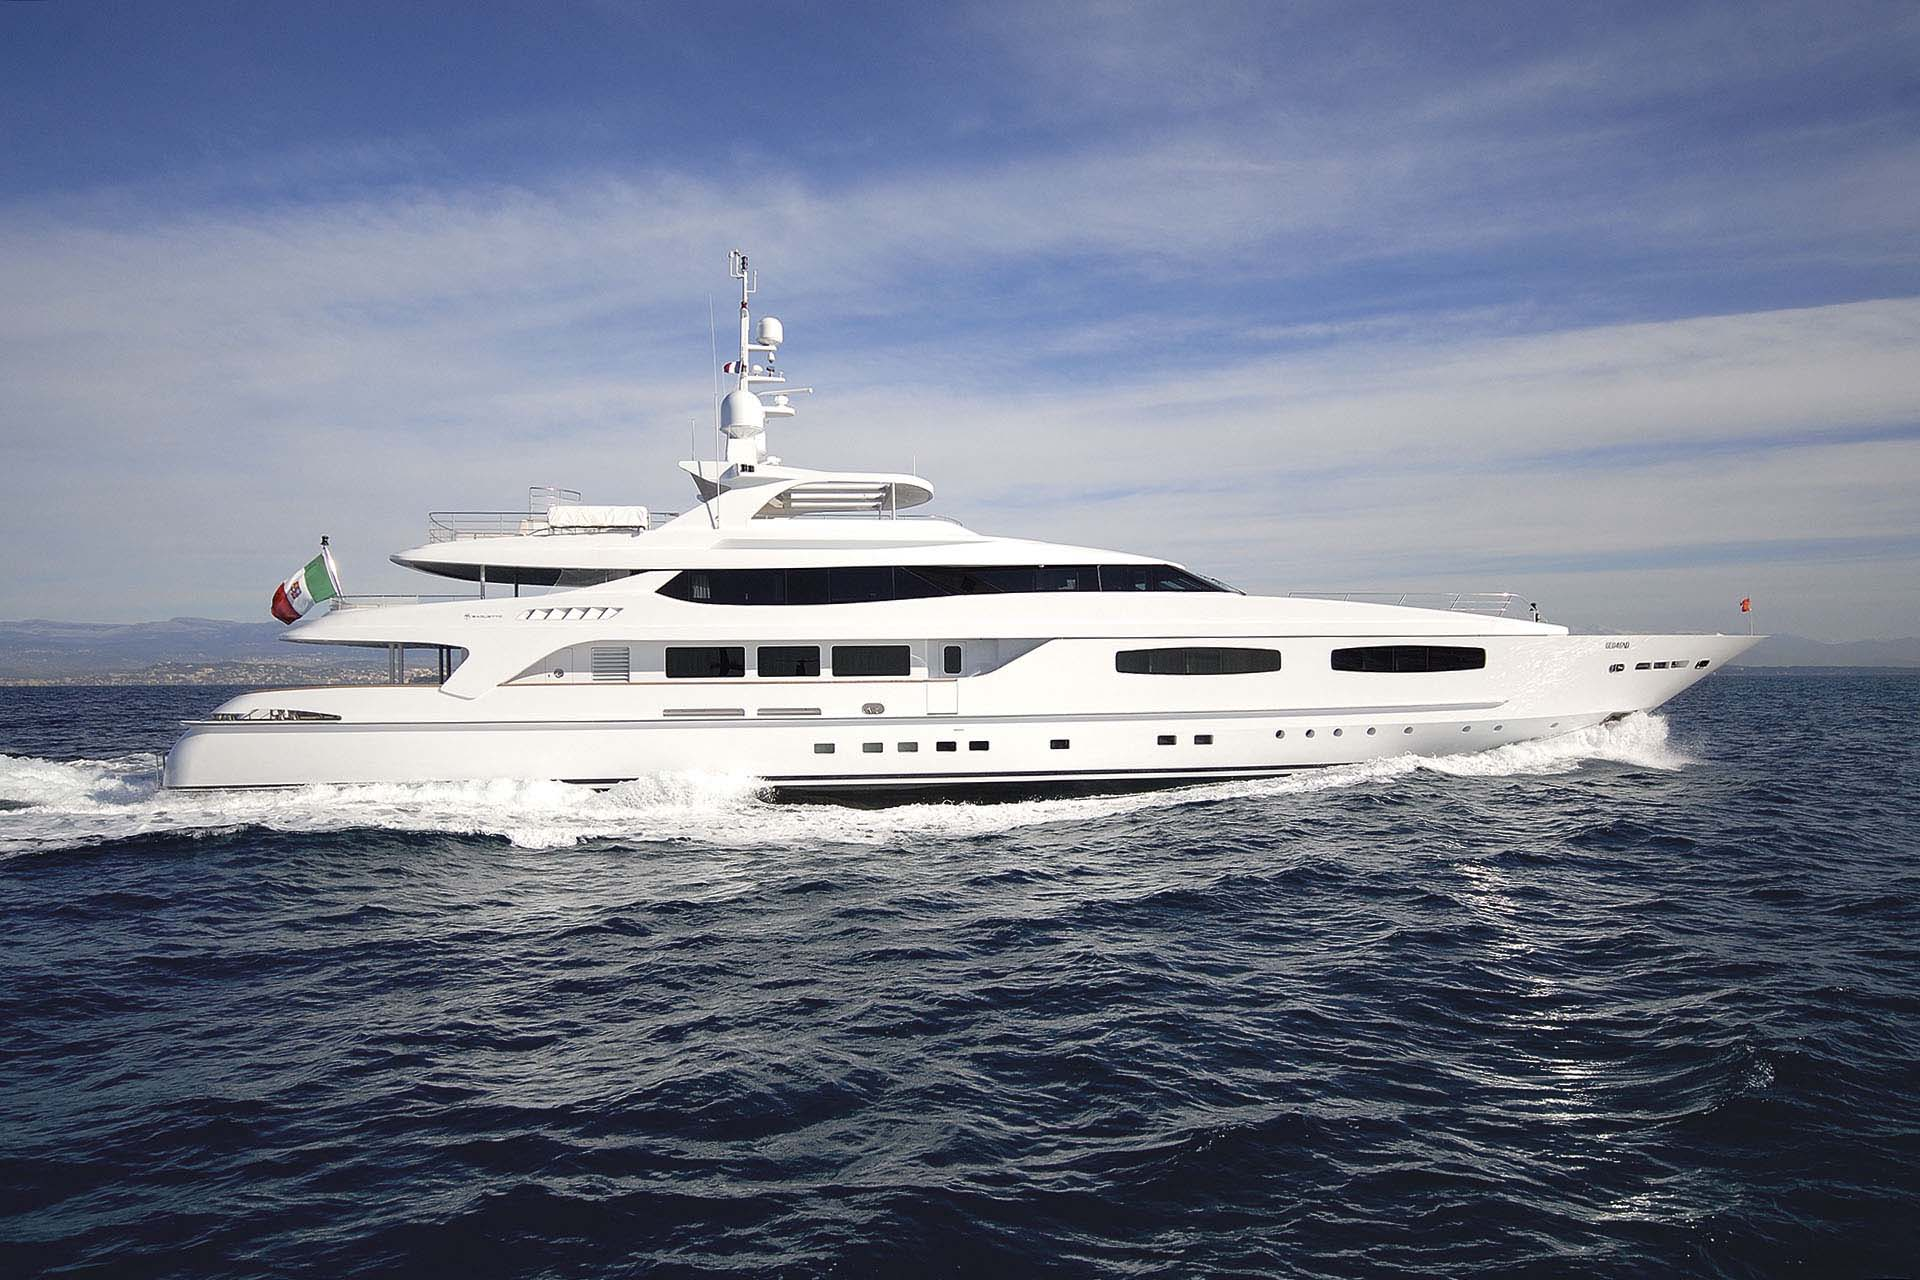 baglietto - GITANA - Paskowsky Yacht Design